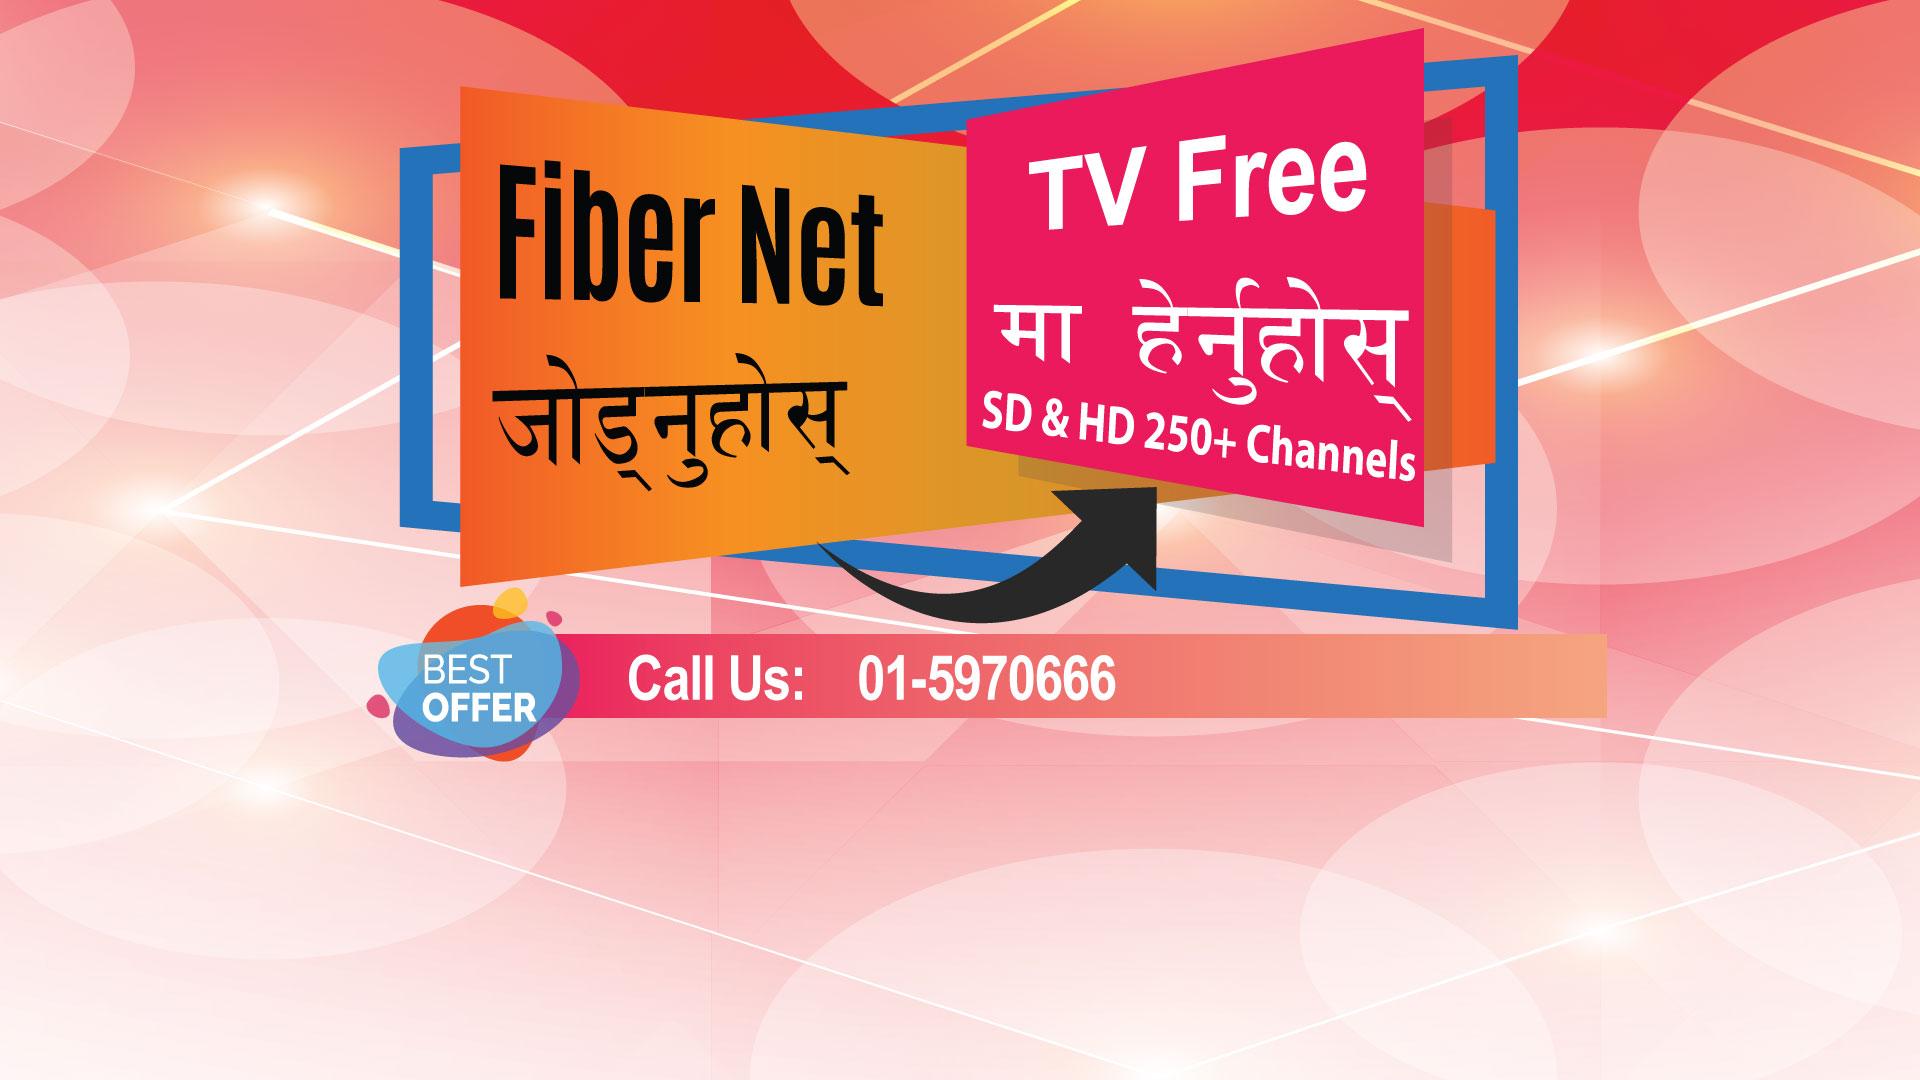 Mero Tv Mso Multi System Operator Licensed Holder In Nepal Digital Tv And Fiber Internet Isp Provider In Nepal